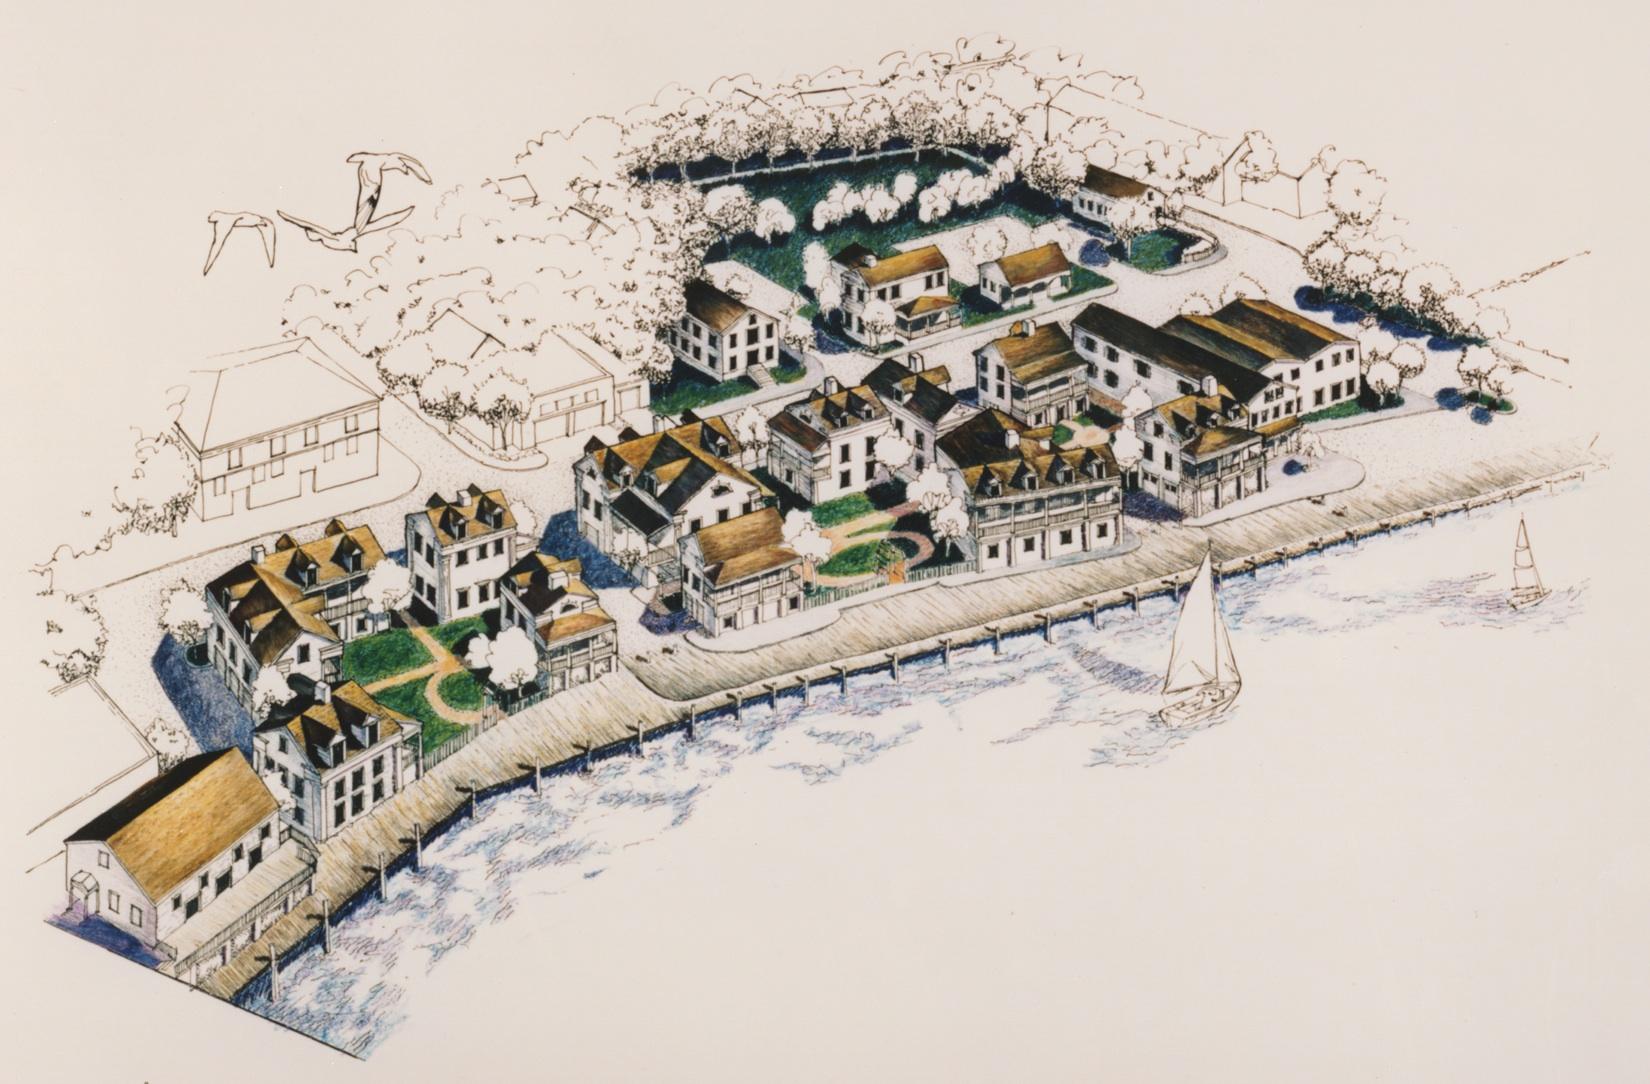 Mystic_Connecticut.Cottrell_Landing_Development.Neighborhood_Planning.Walkable.Robert_Orr_&_Associates.Architecture.Landscape_Architecture.New_Urbanism.Windom.Whole_Project.jpg